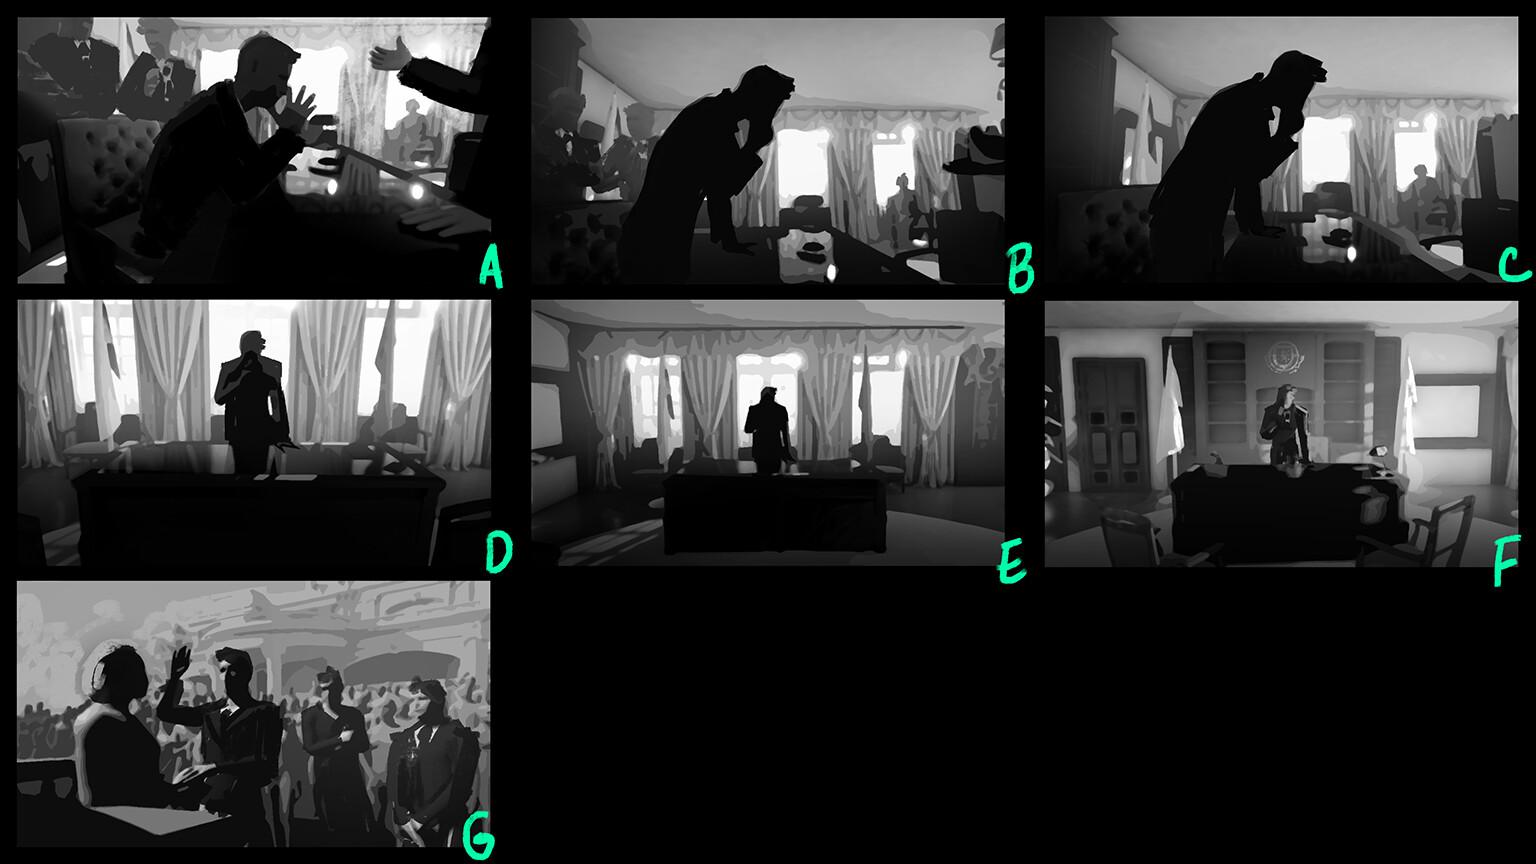 Thumnails exploring different scene ideas